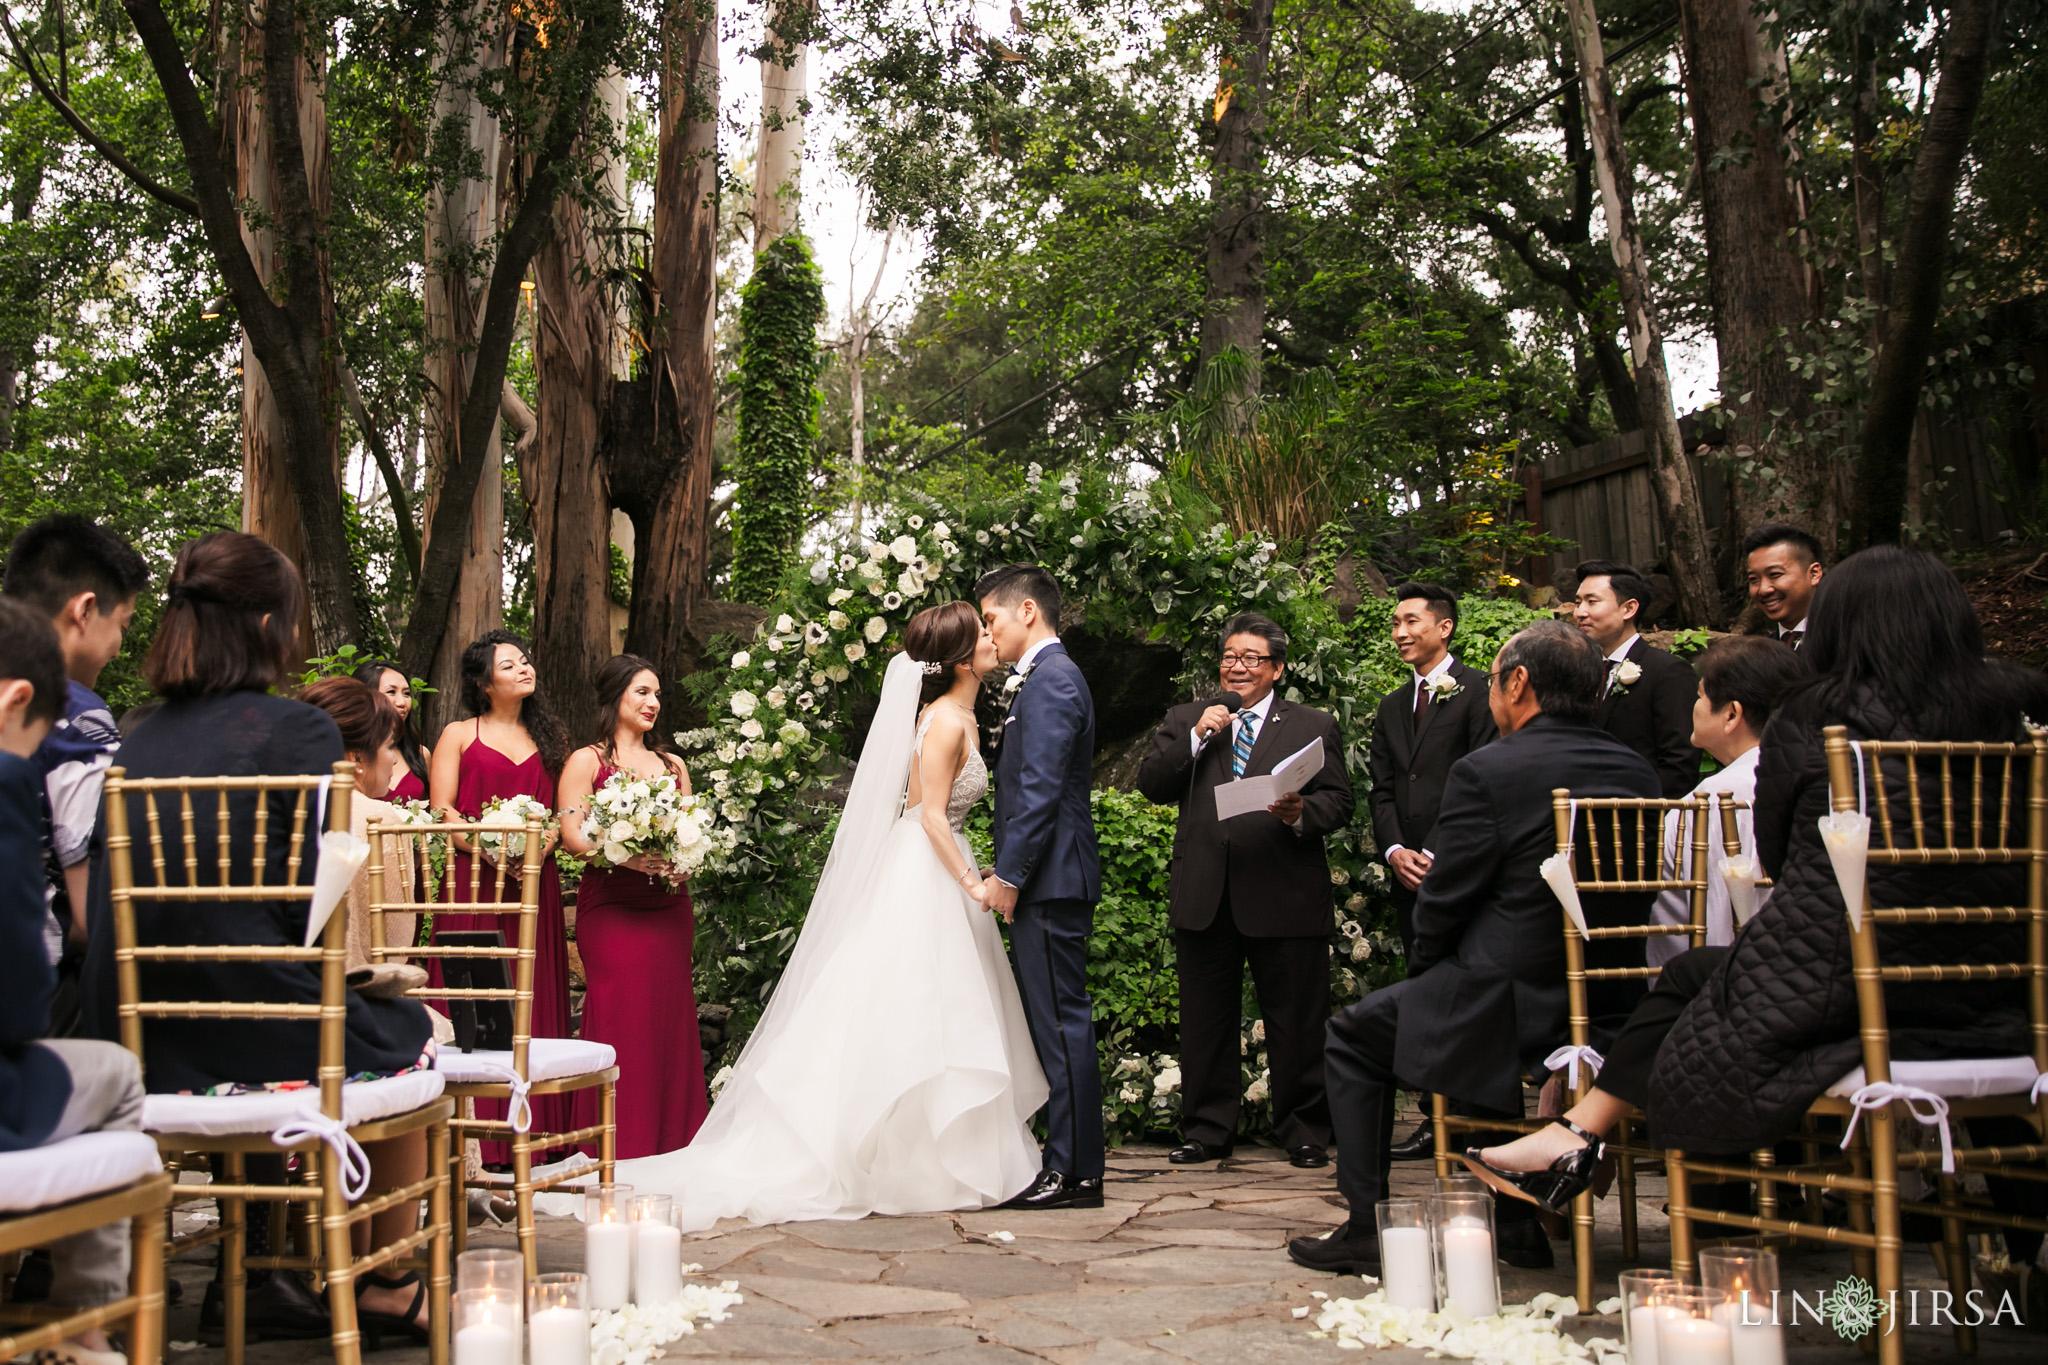 25 Calamigos Ranch Malibu Wedding Photography